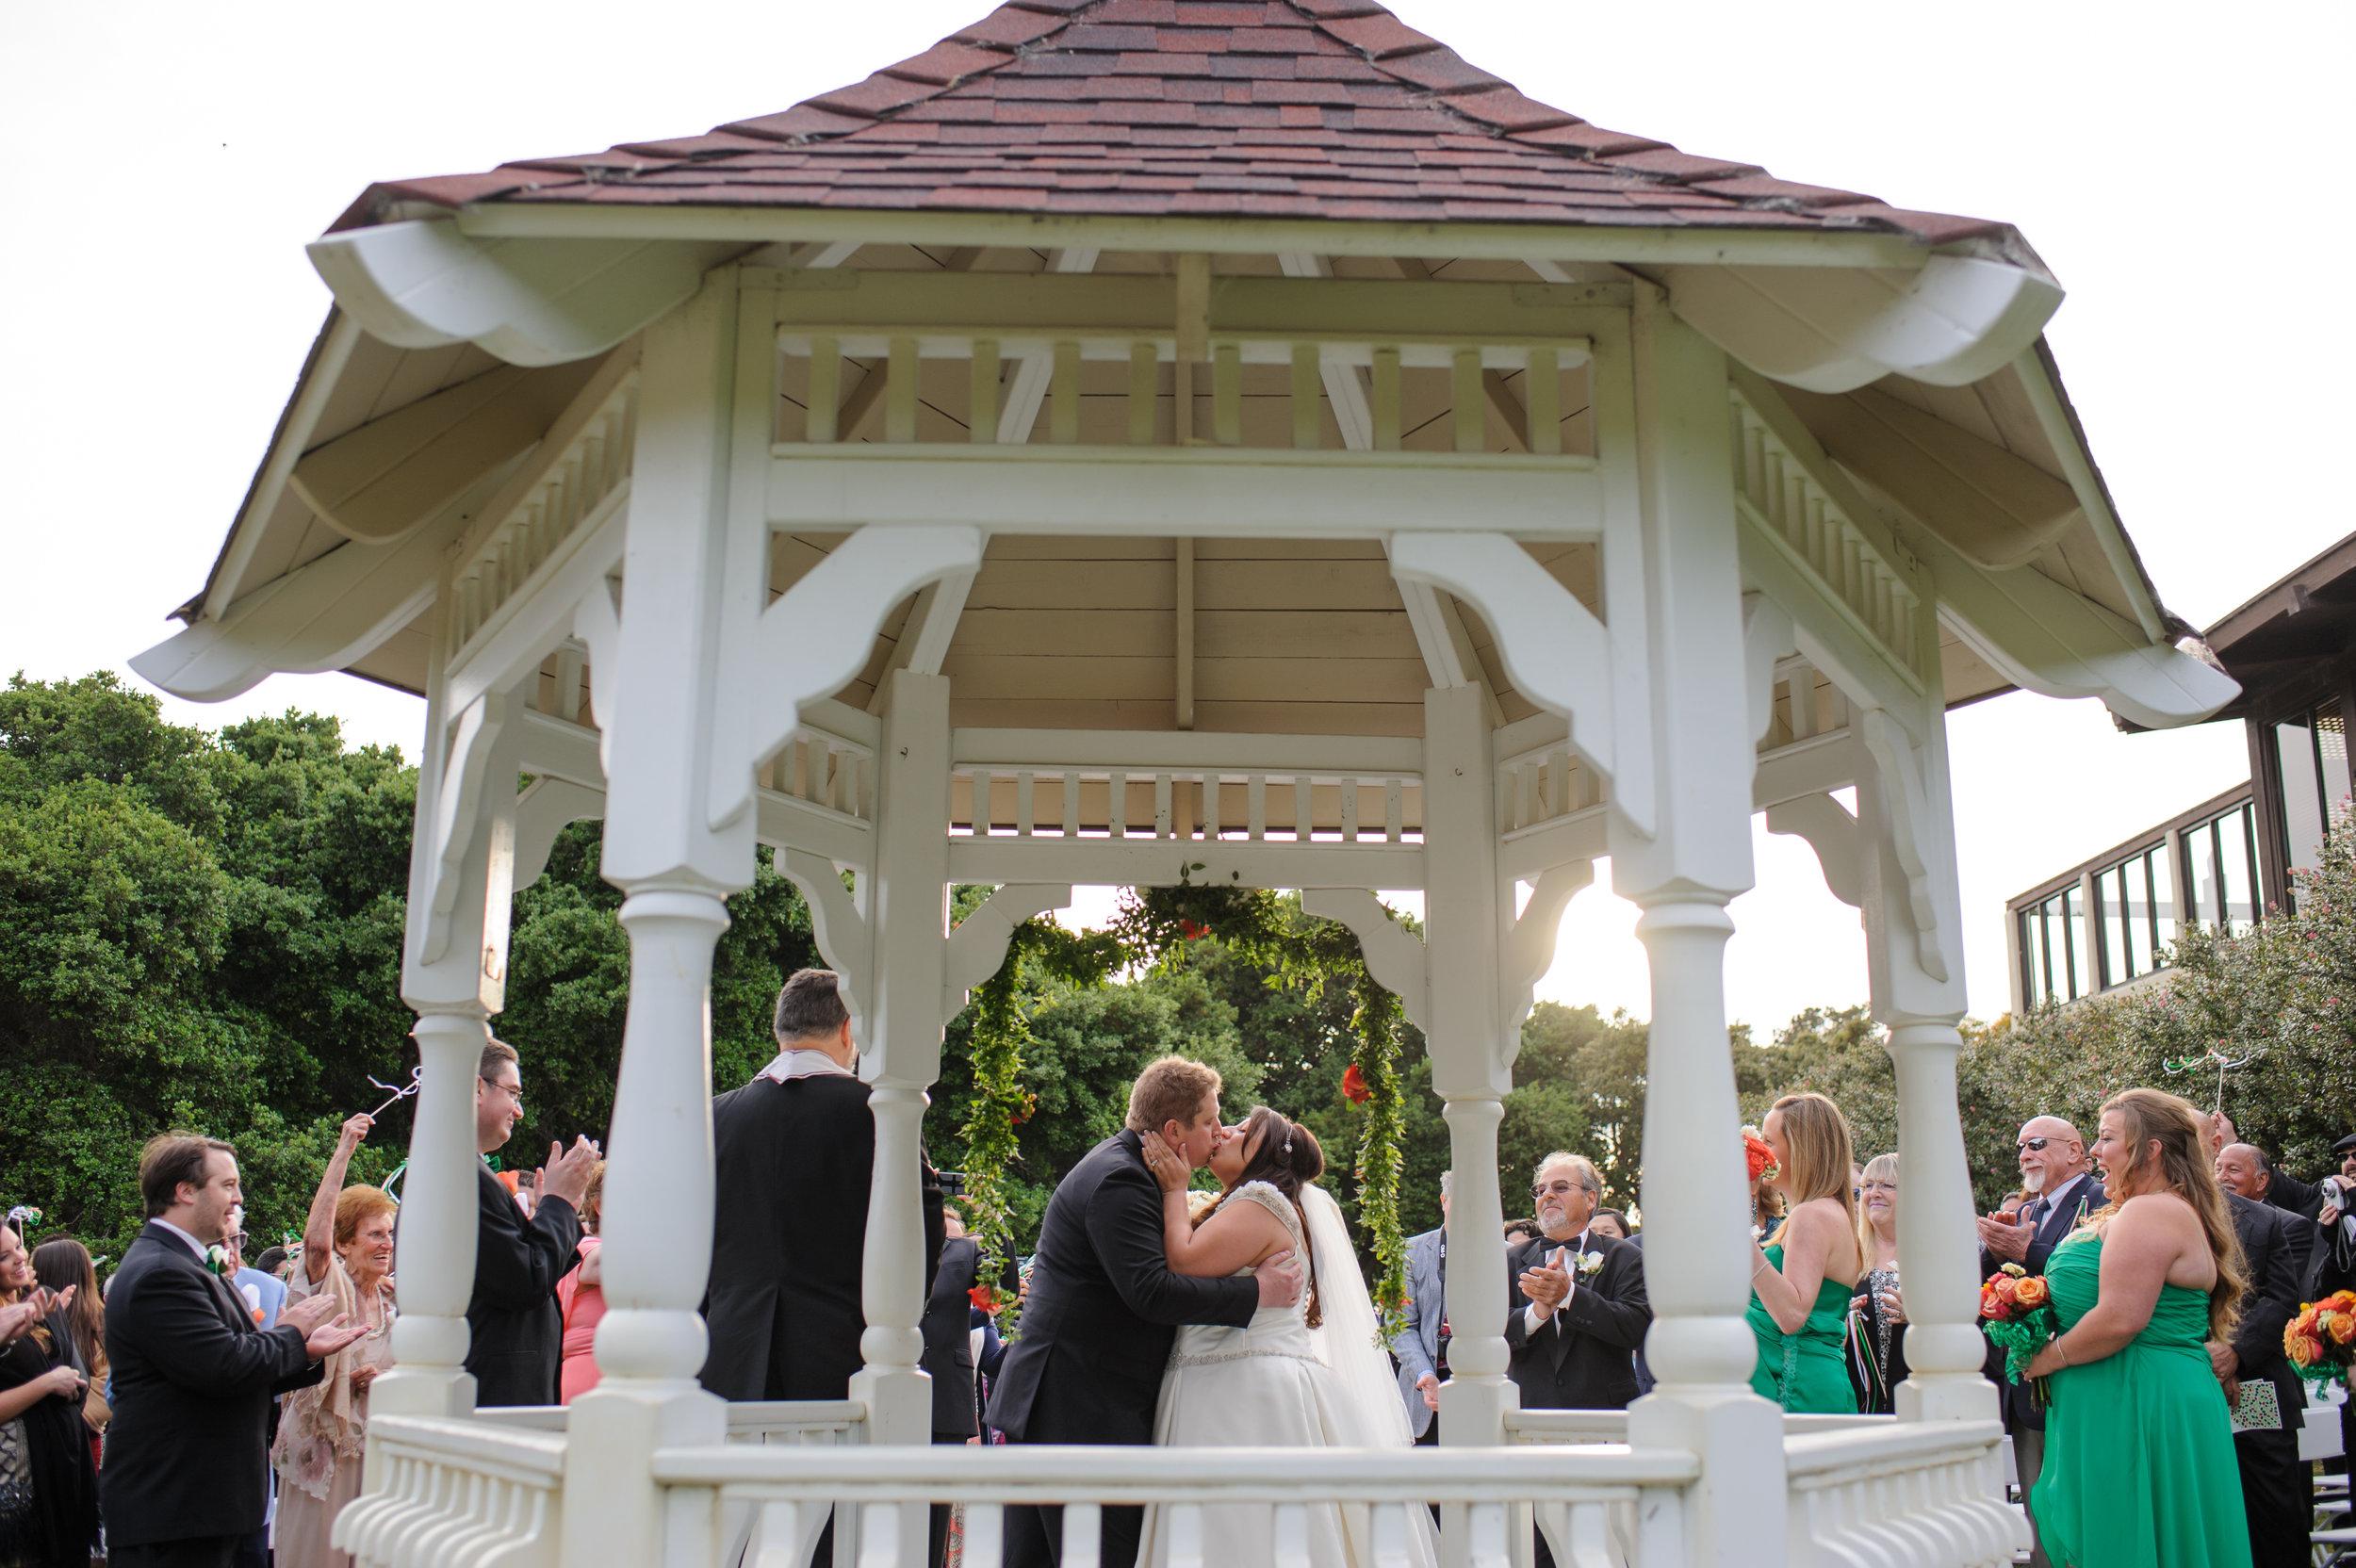 lauren-joel-001-rancho-canada-golf-course-carmel-wedding-photographer-katherine-nicole-photography016.JPG